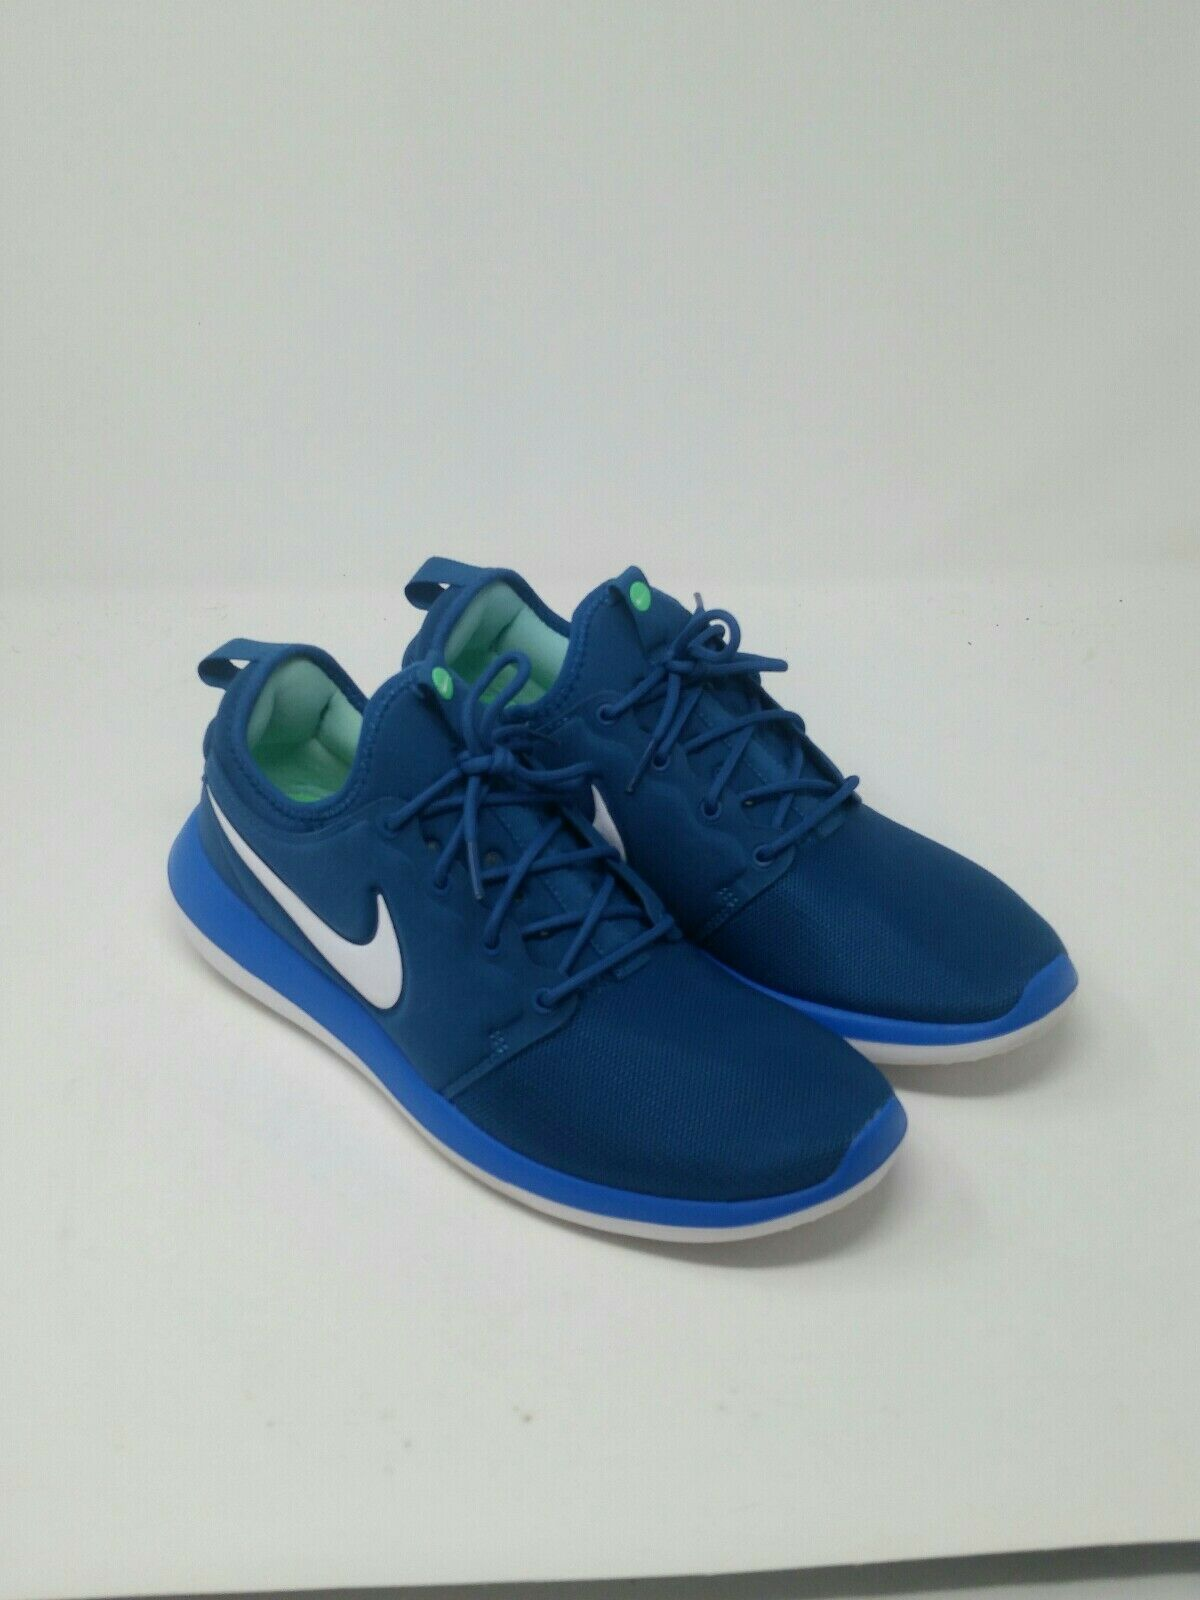 Nike Men 65533;s Roshe Due  Scarpe Industriali blu bianca Dimensione USA  vendite dirette della fabbrica